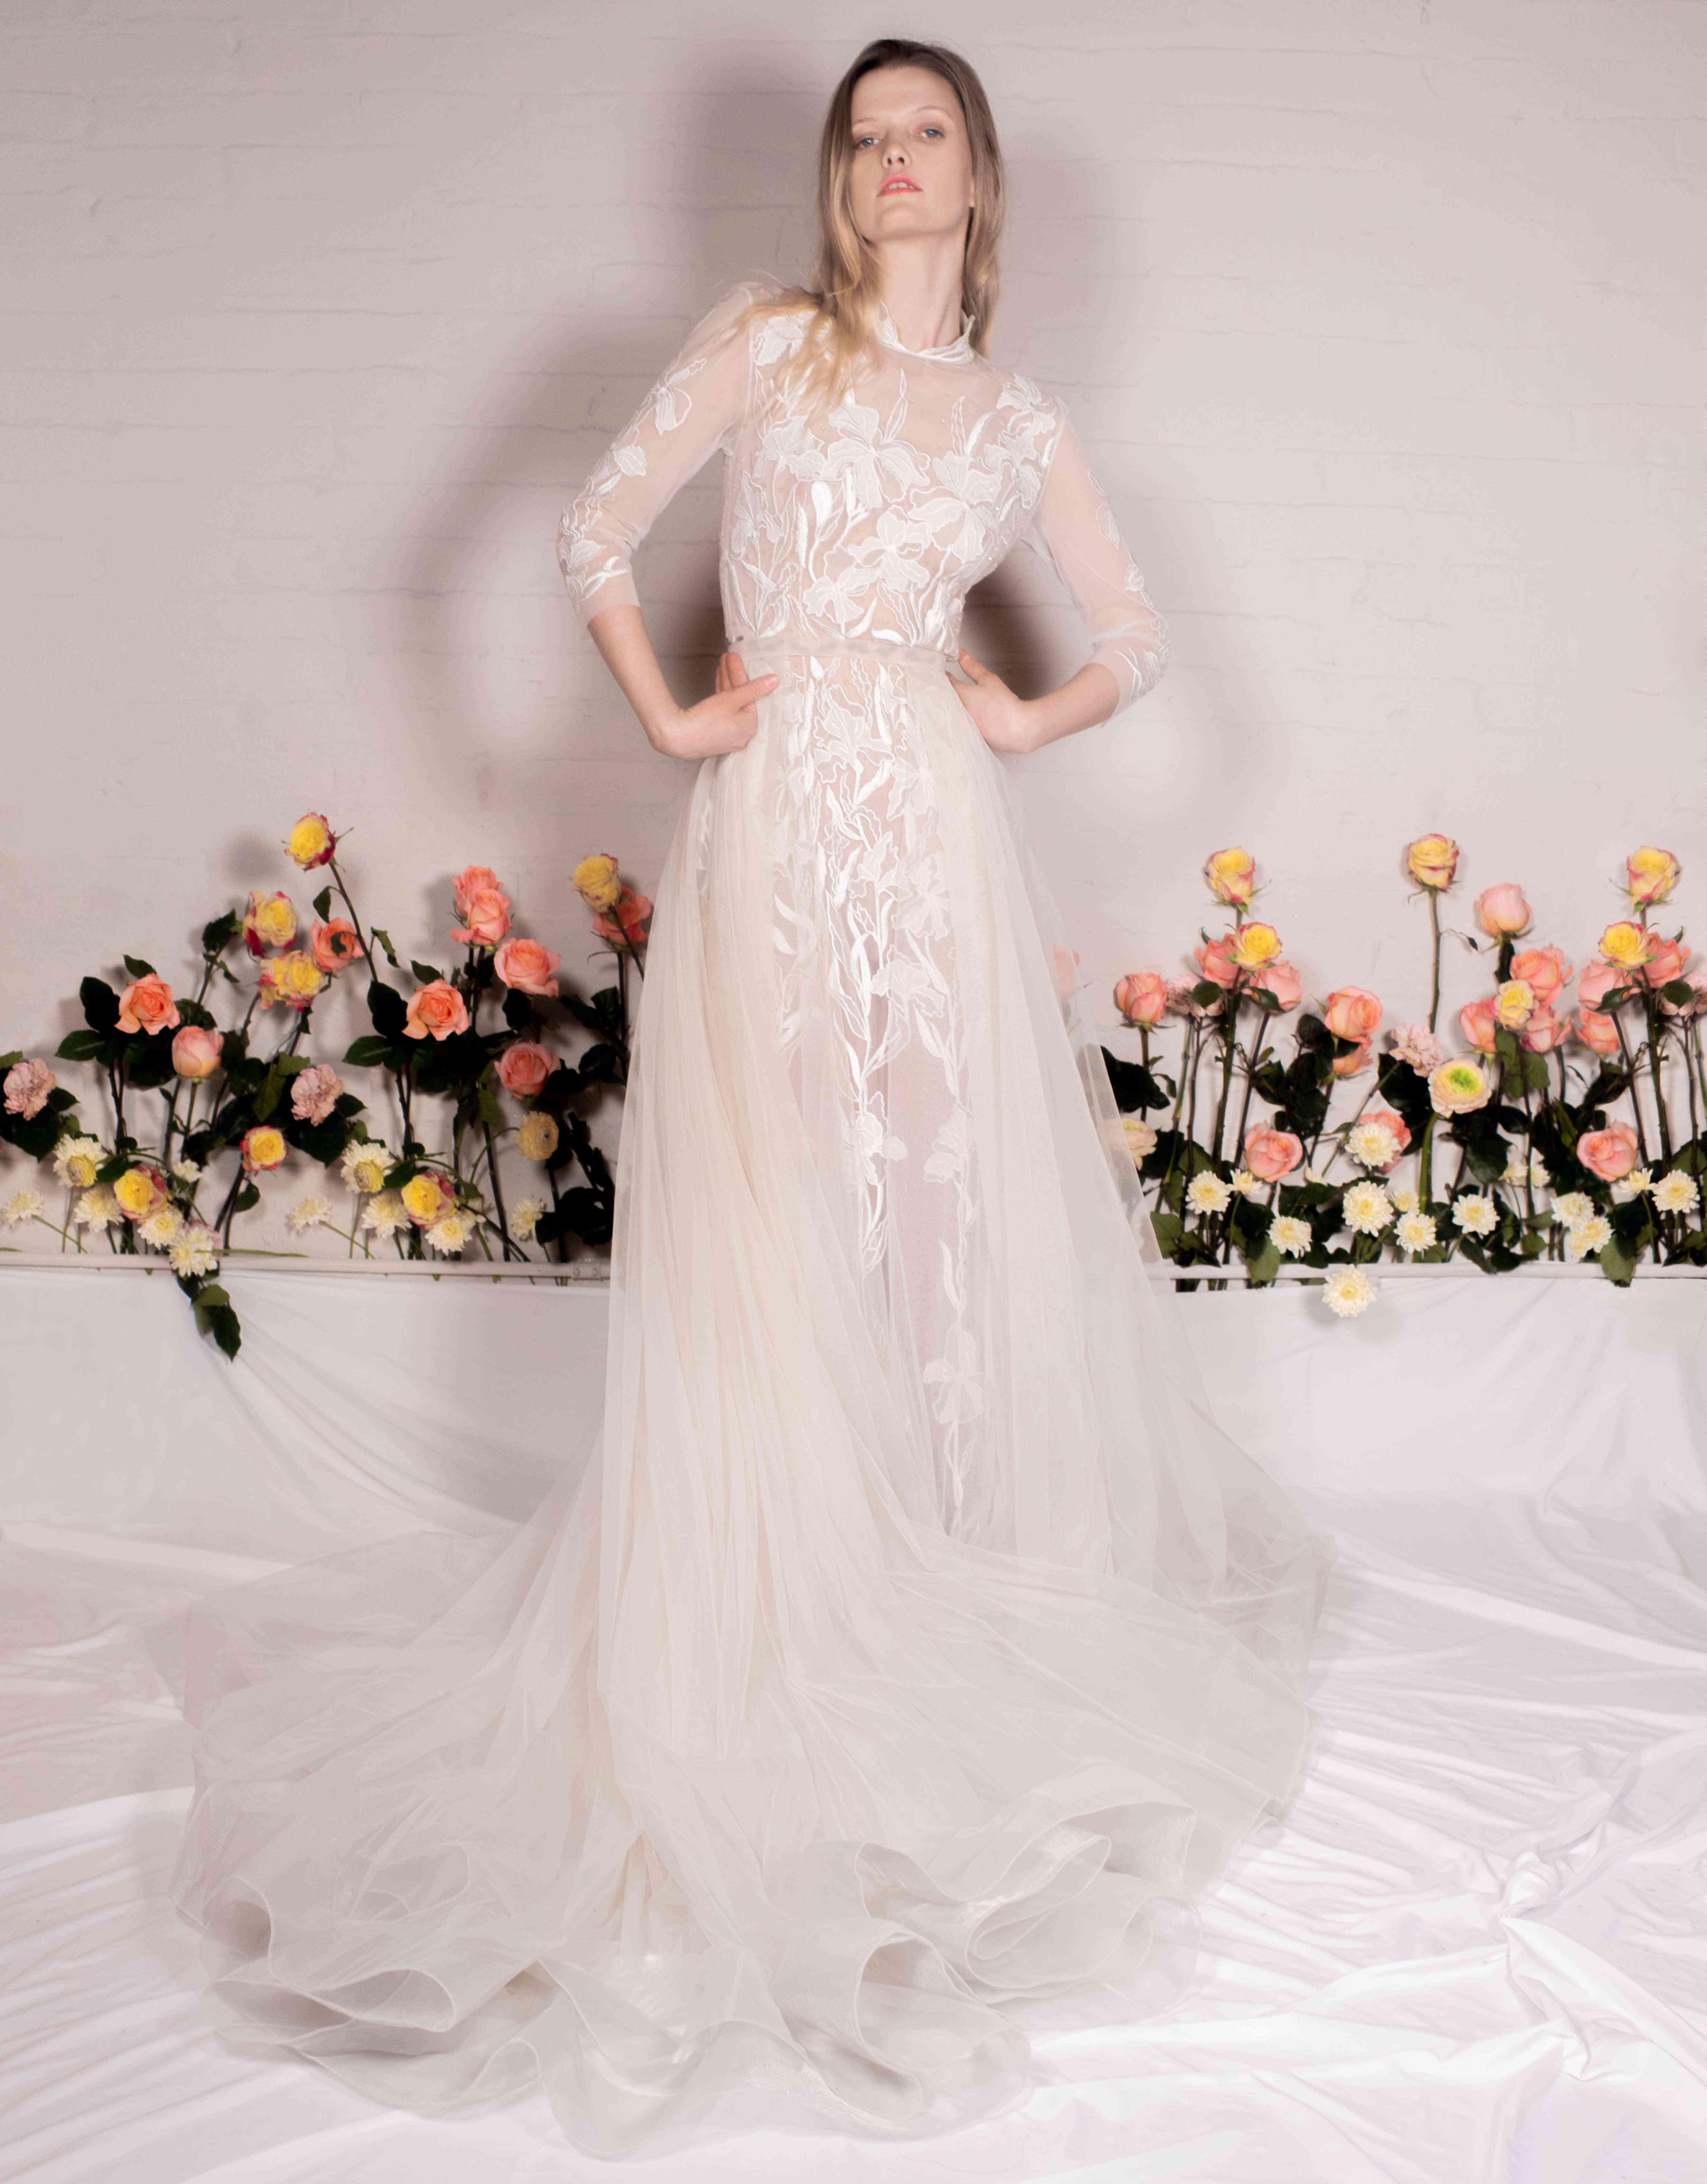 Riverside Iris wedding dress and Blush Tulle overskirt